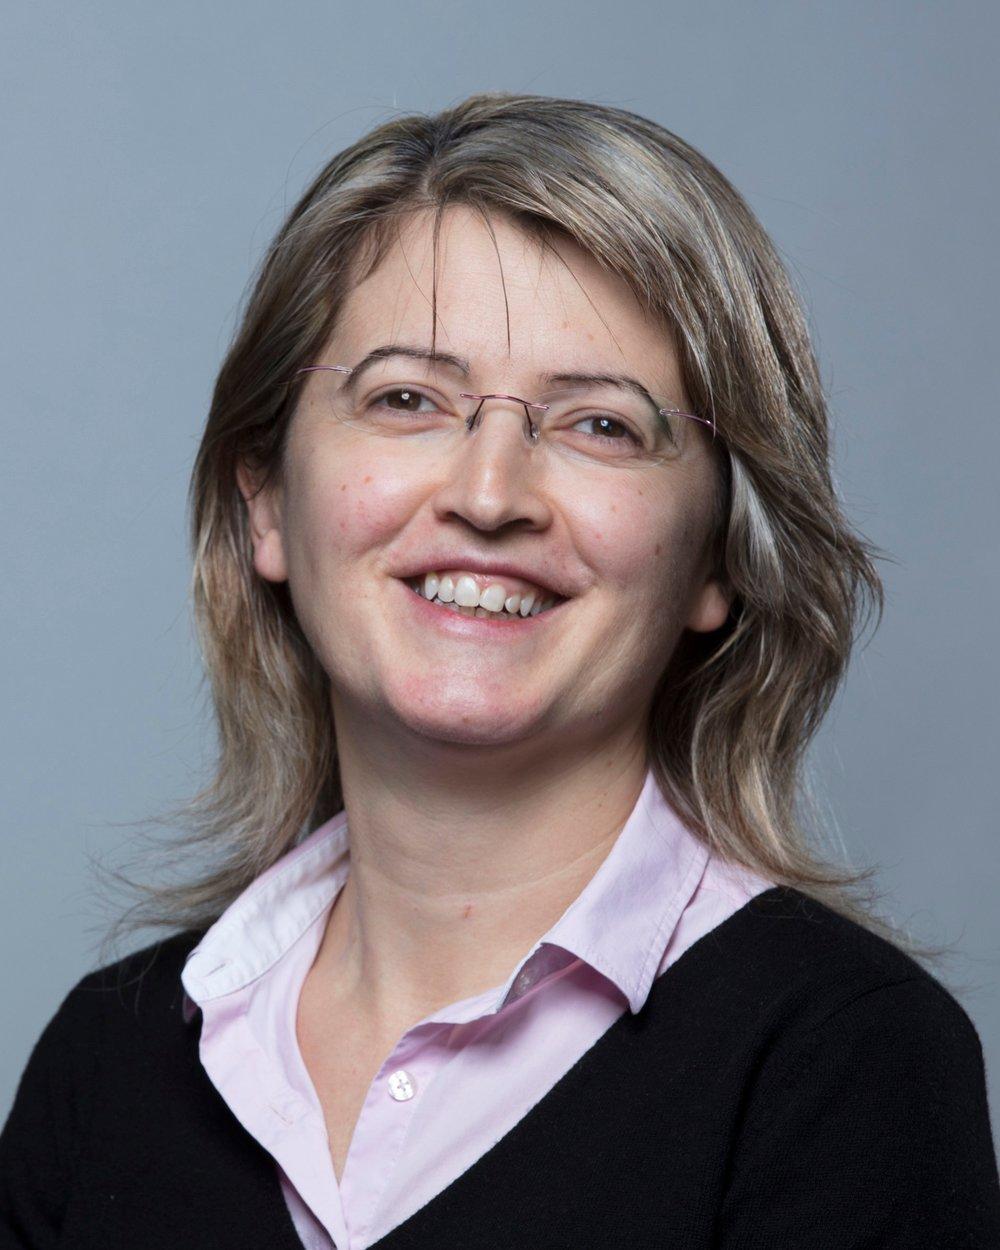 Aida Omerovic